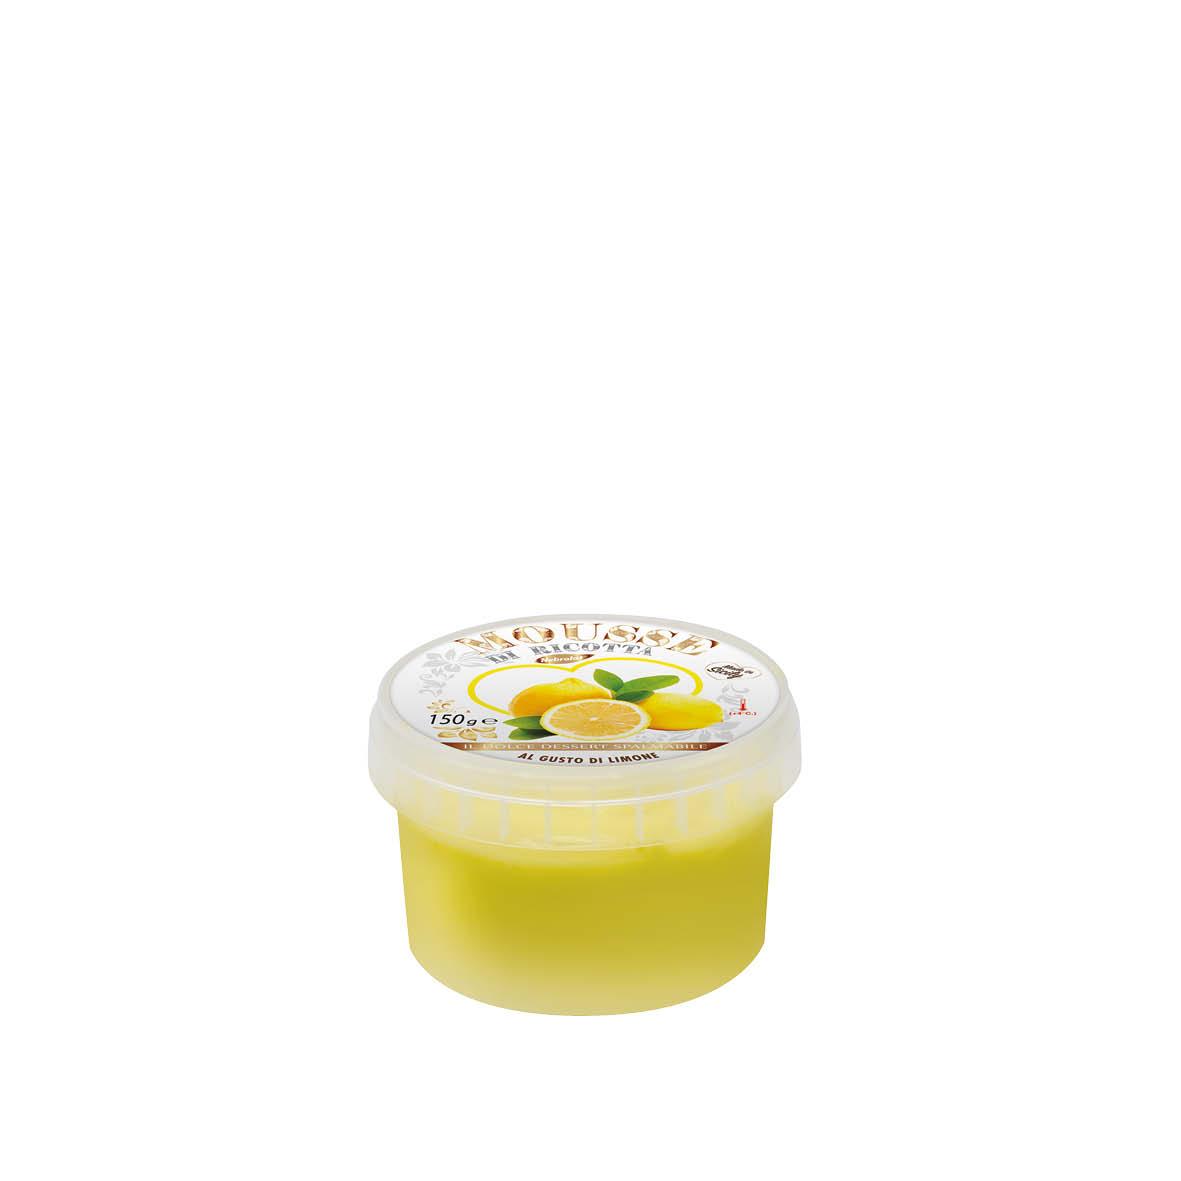 Mousse di Ricotta al Limone gr 150℮